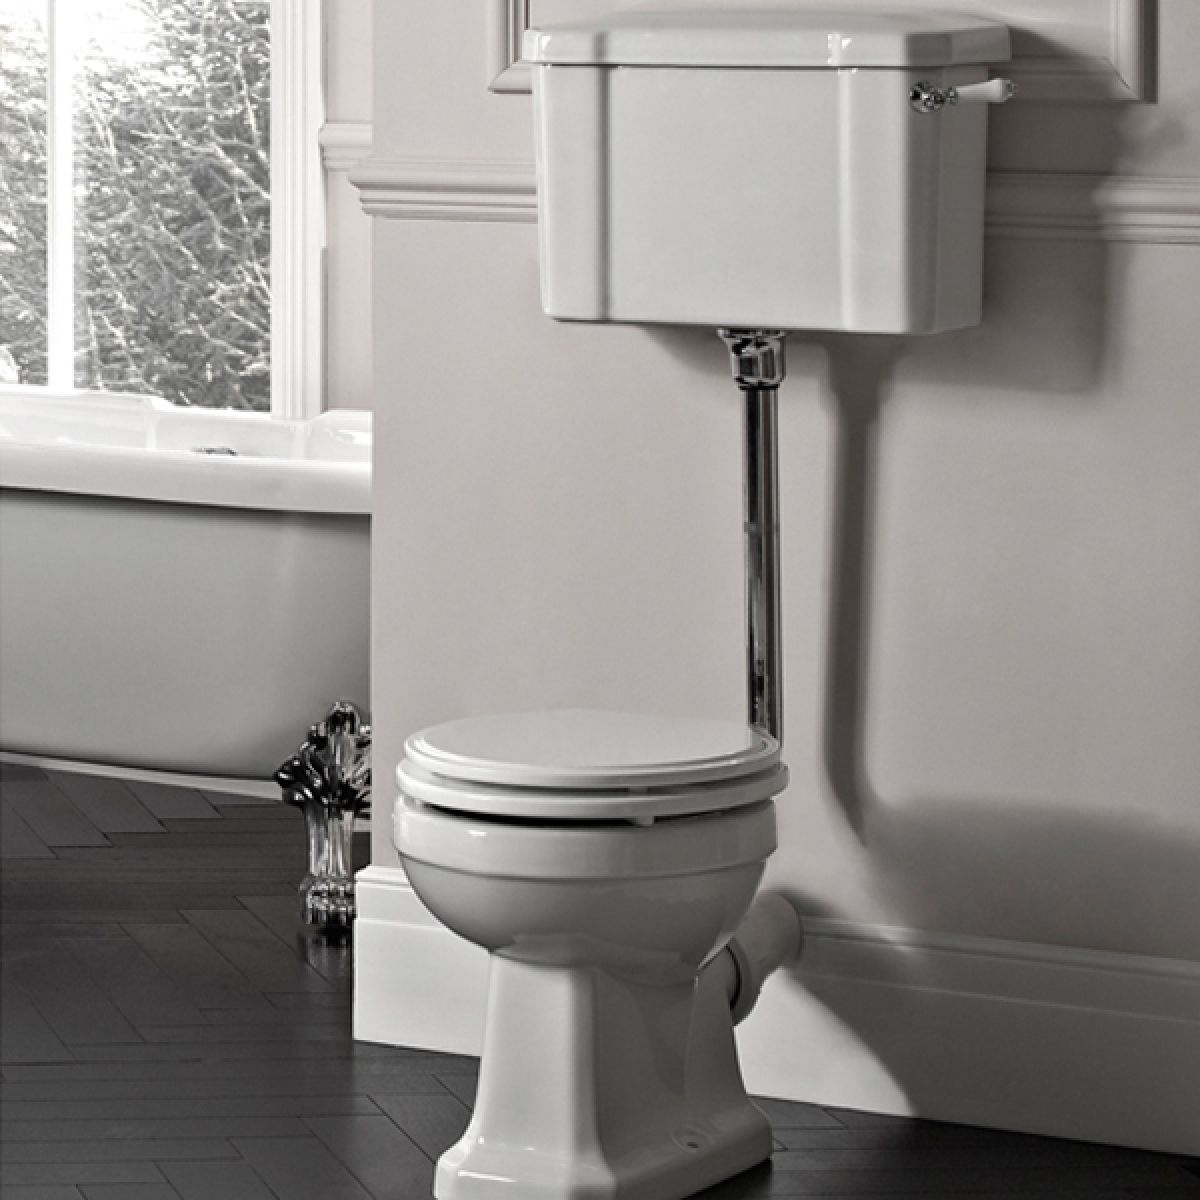 Tavistock Vitoria Low Level Toilet - White Gloss Seat